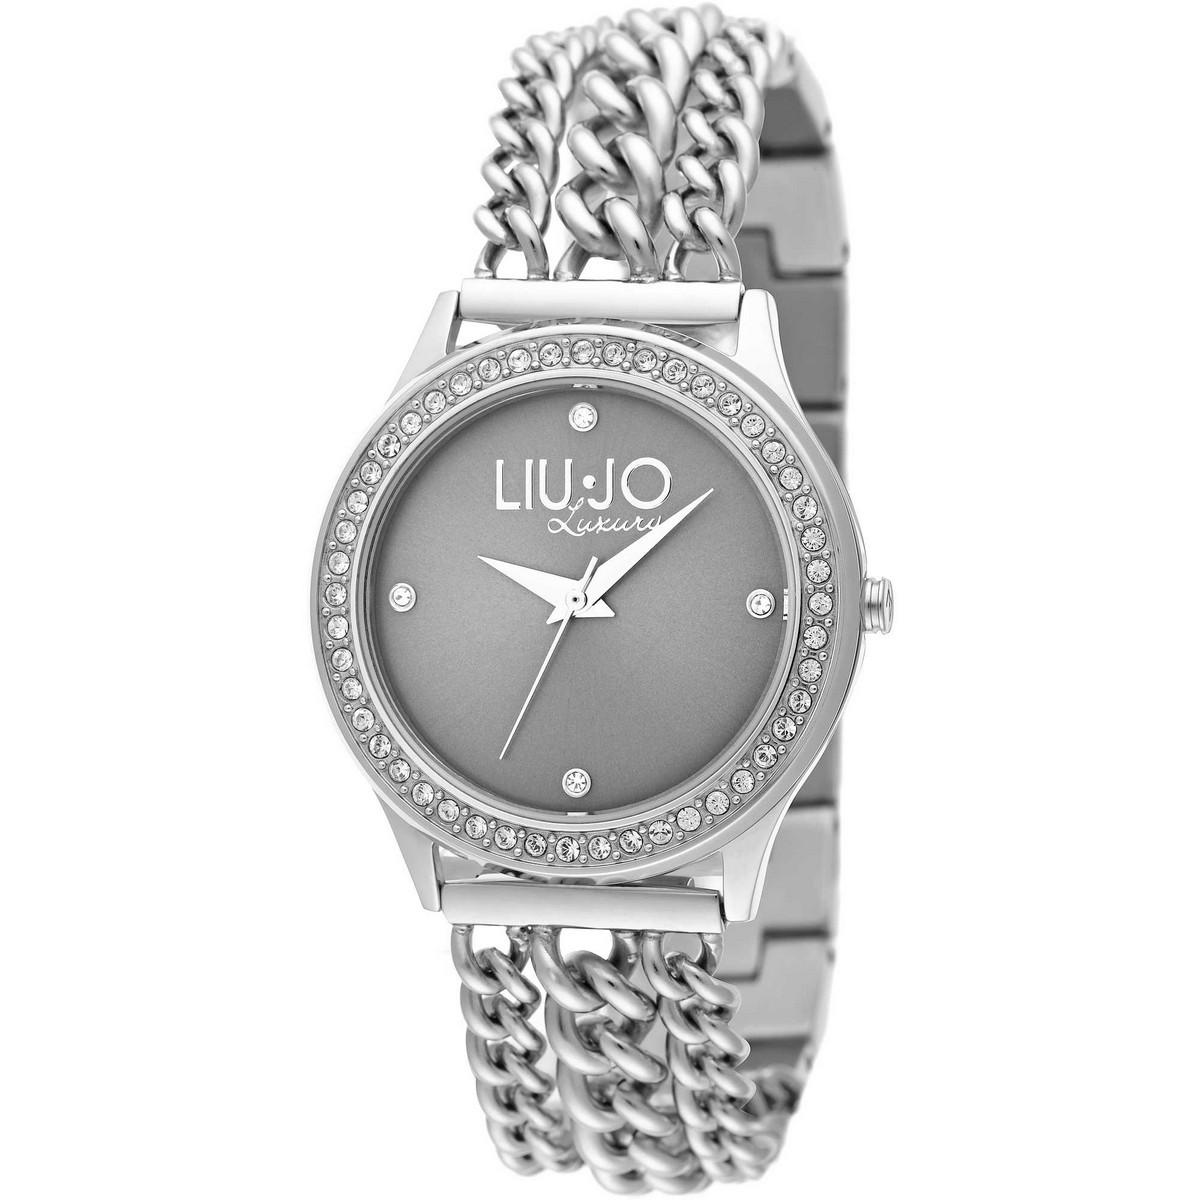 Orologio Liu Jo Luxury Atena argento TLJ936 - Paradiso Gioielli 8acd54fd237